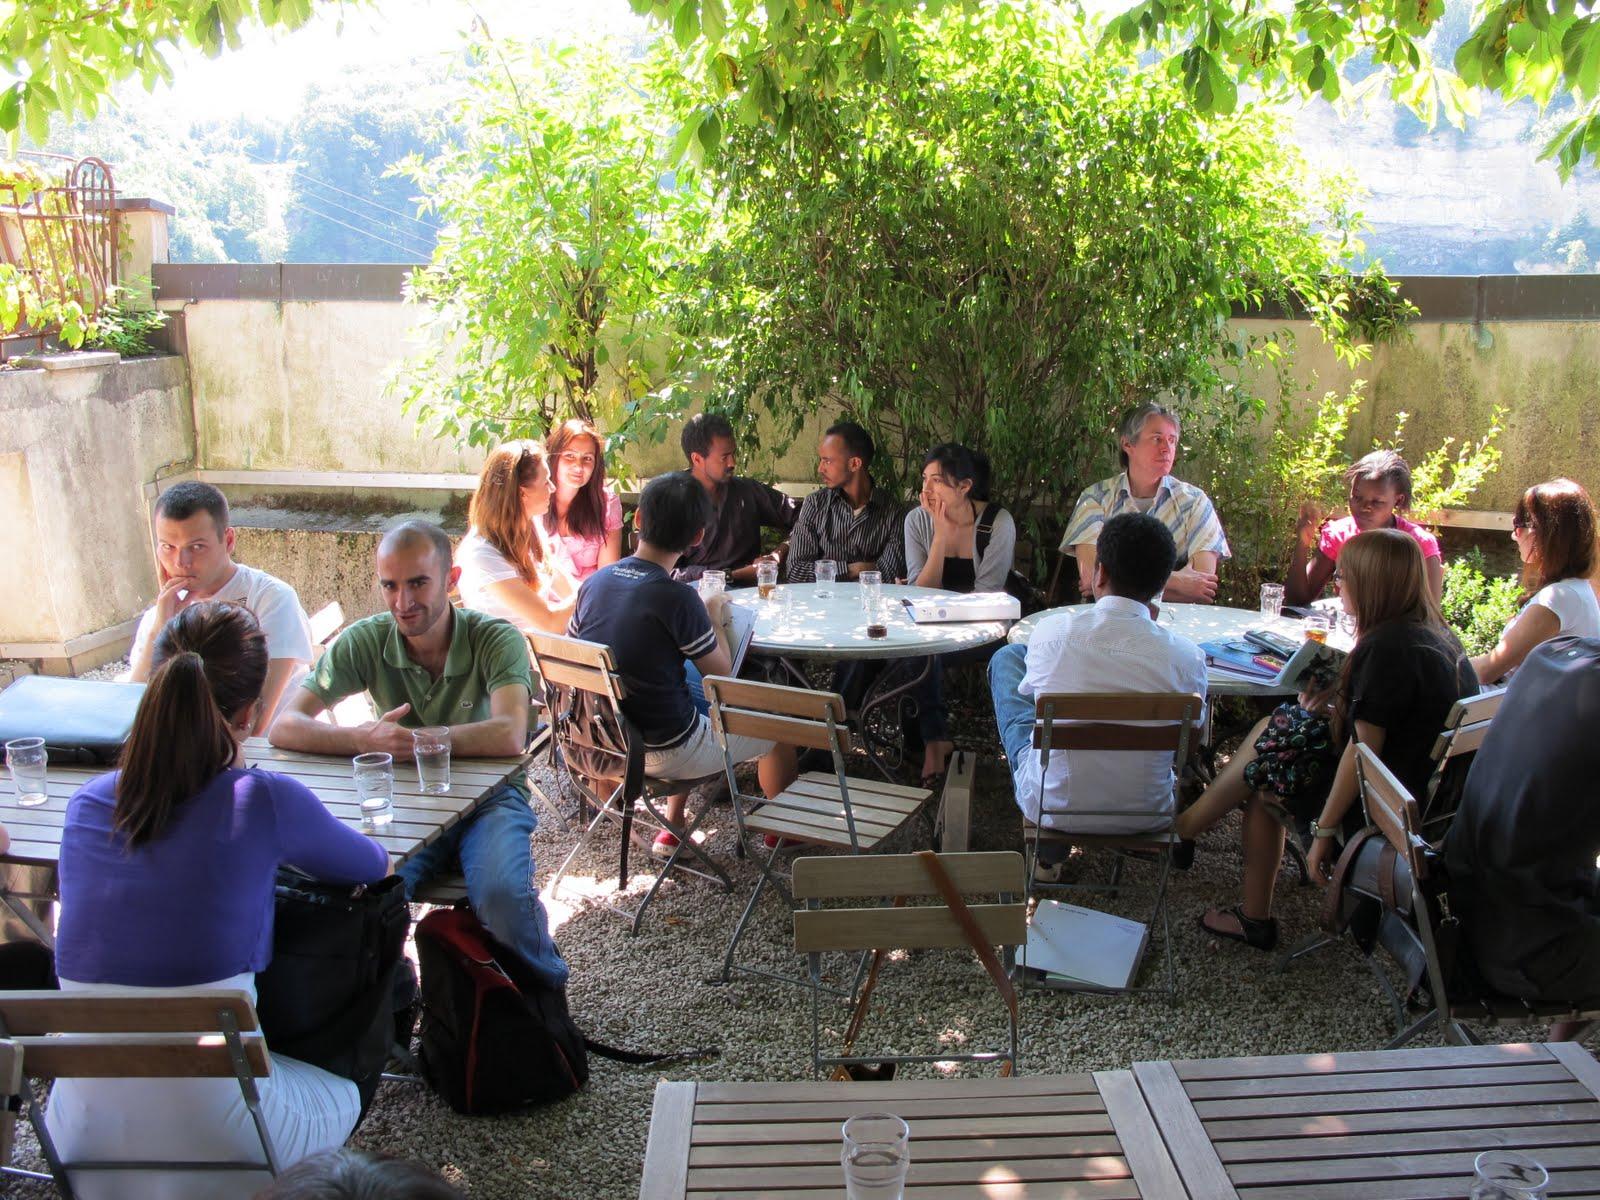 Vkhs cius tour de ville 5 juillet 2011 for Piscine 5 juillet